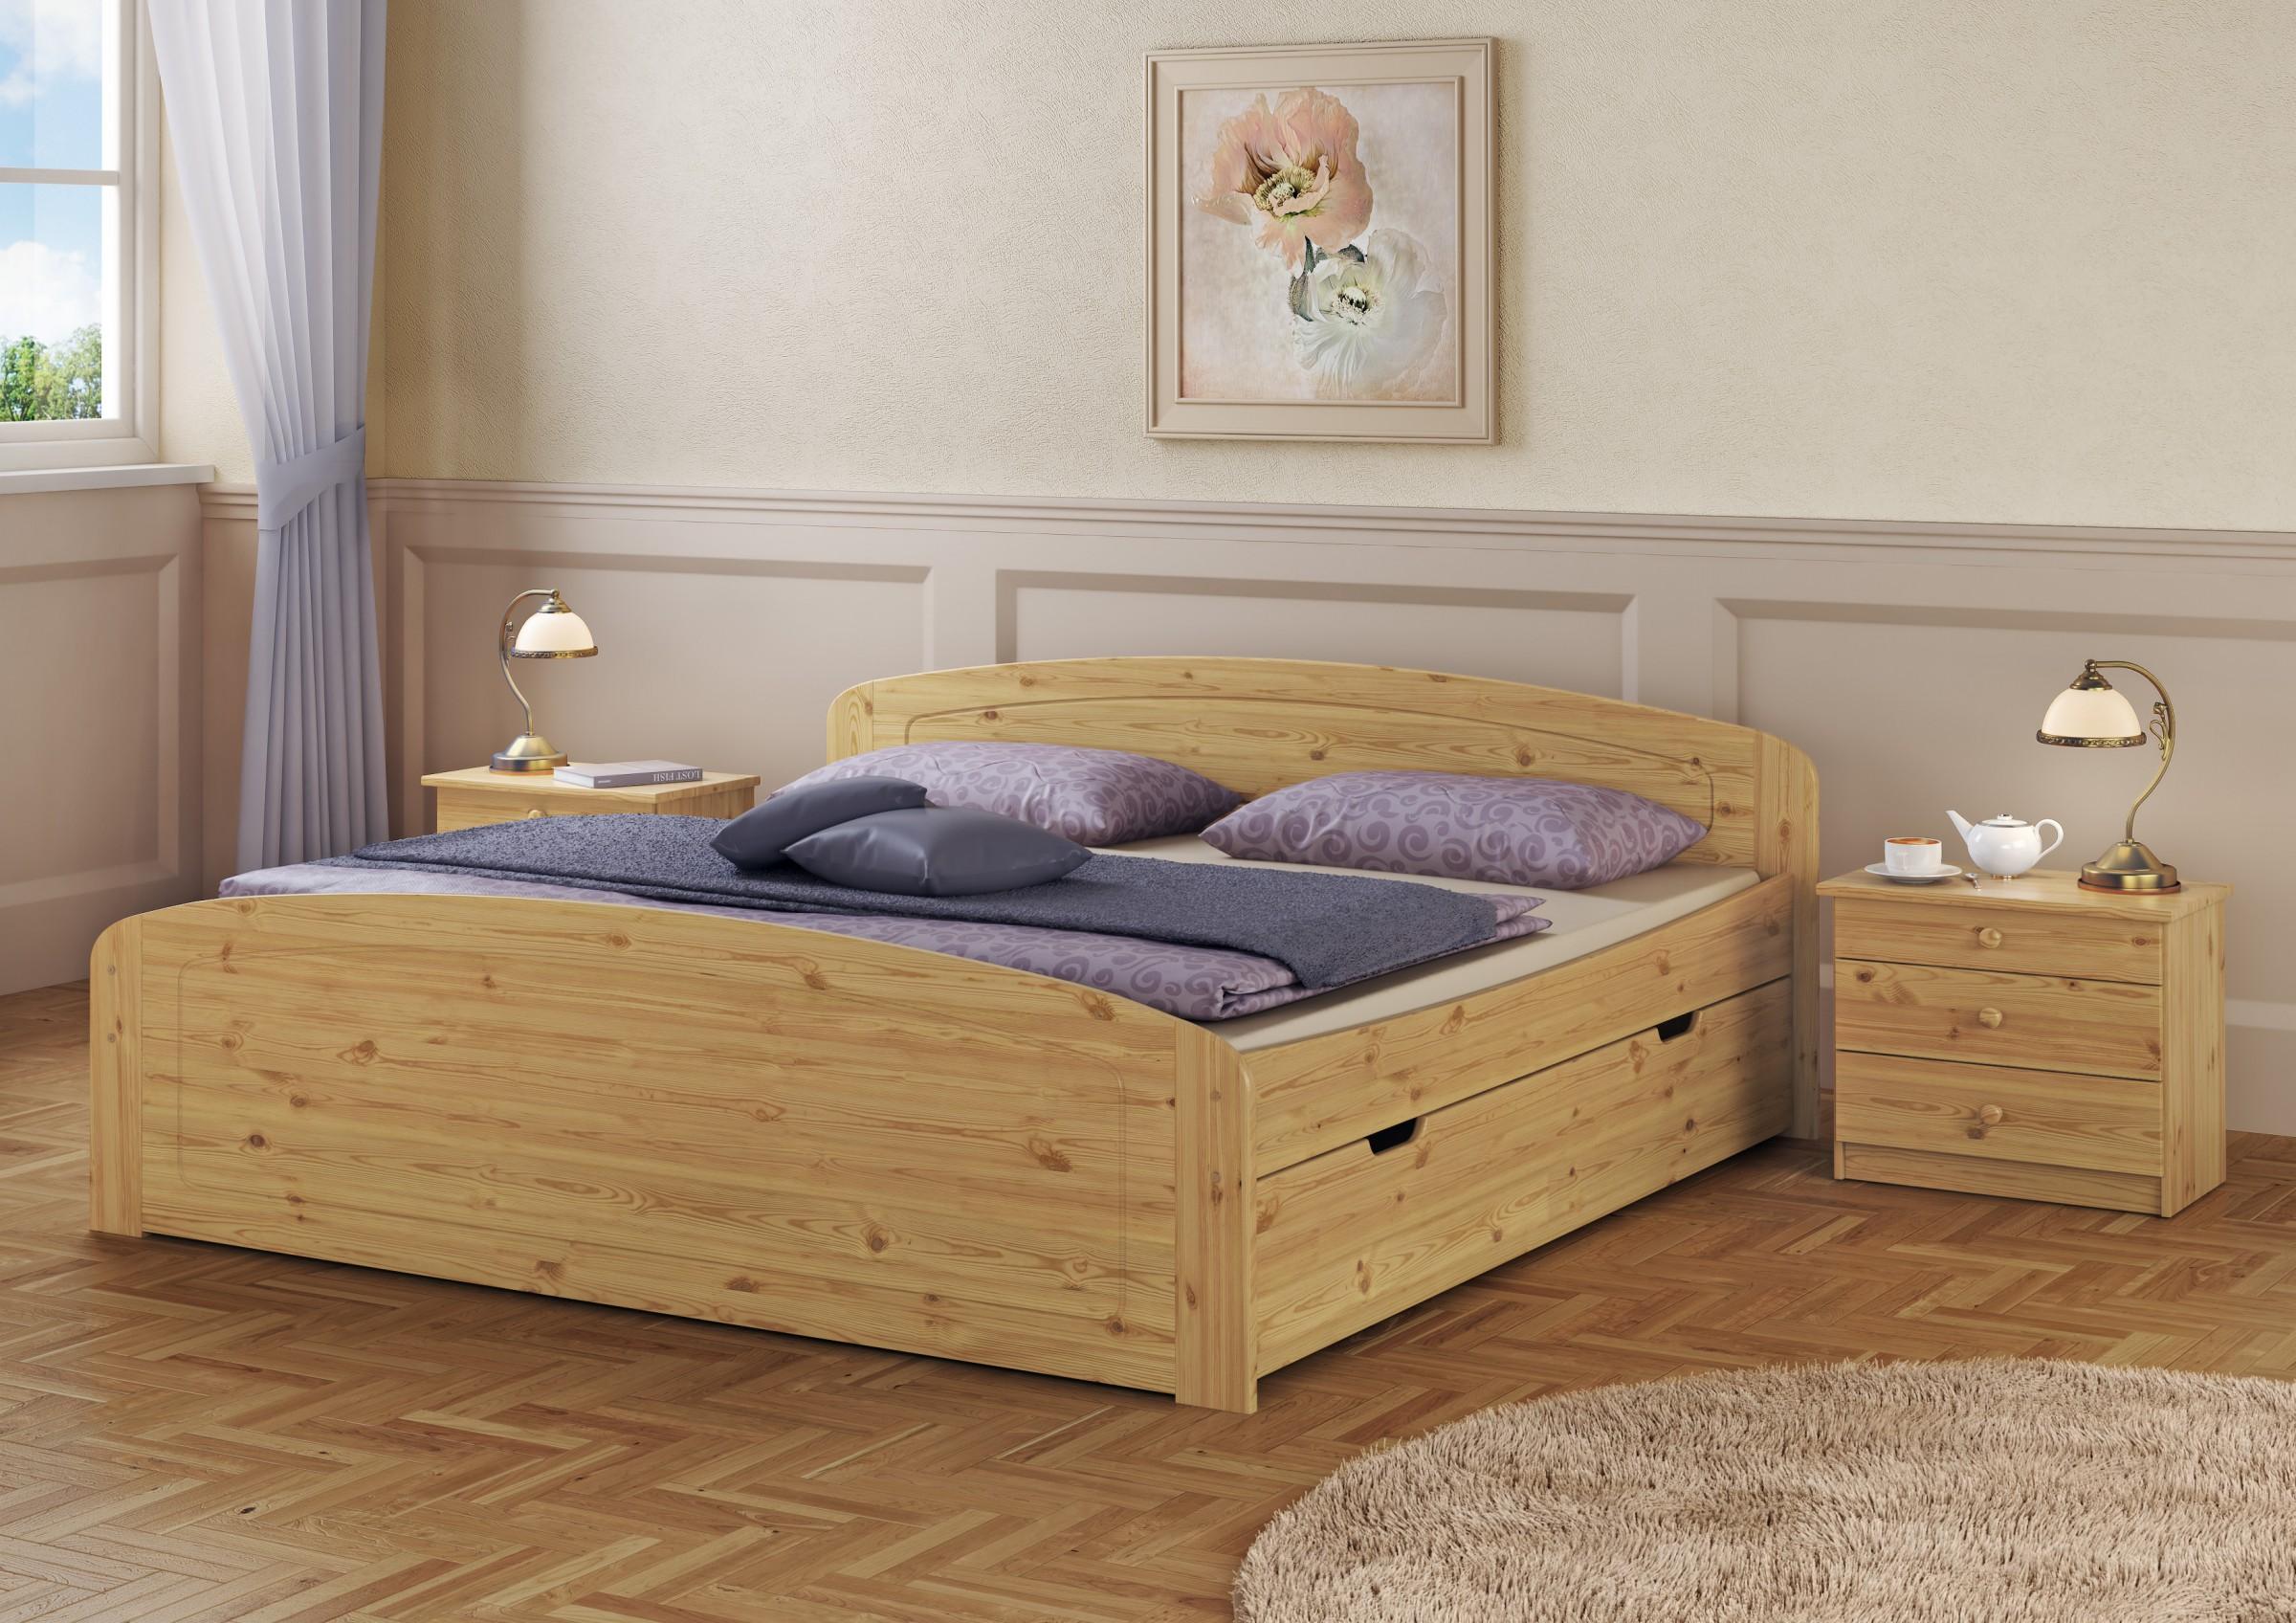 doppelbett bettkasten rollrost matratze 180x200 seniorenbett kiefer m. Black Bedroom Furniture Sets. Home Design Ideas